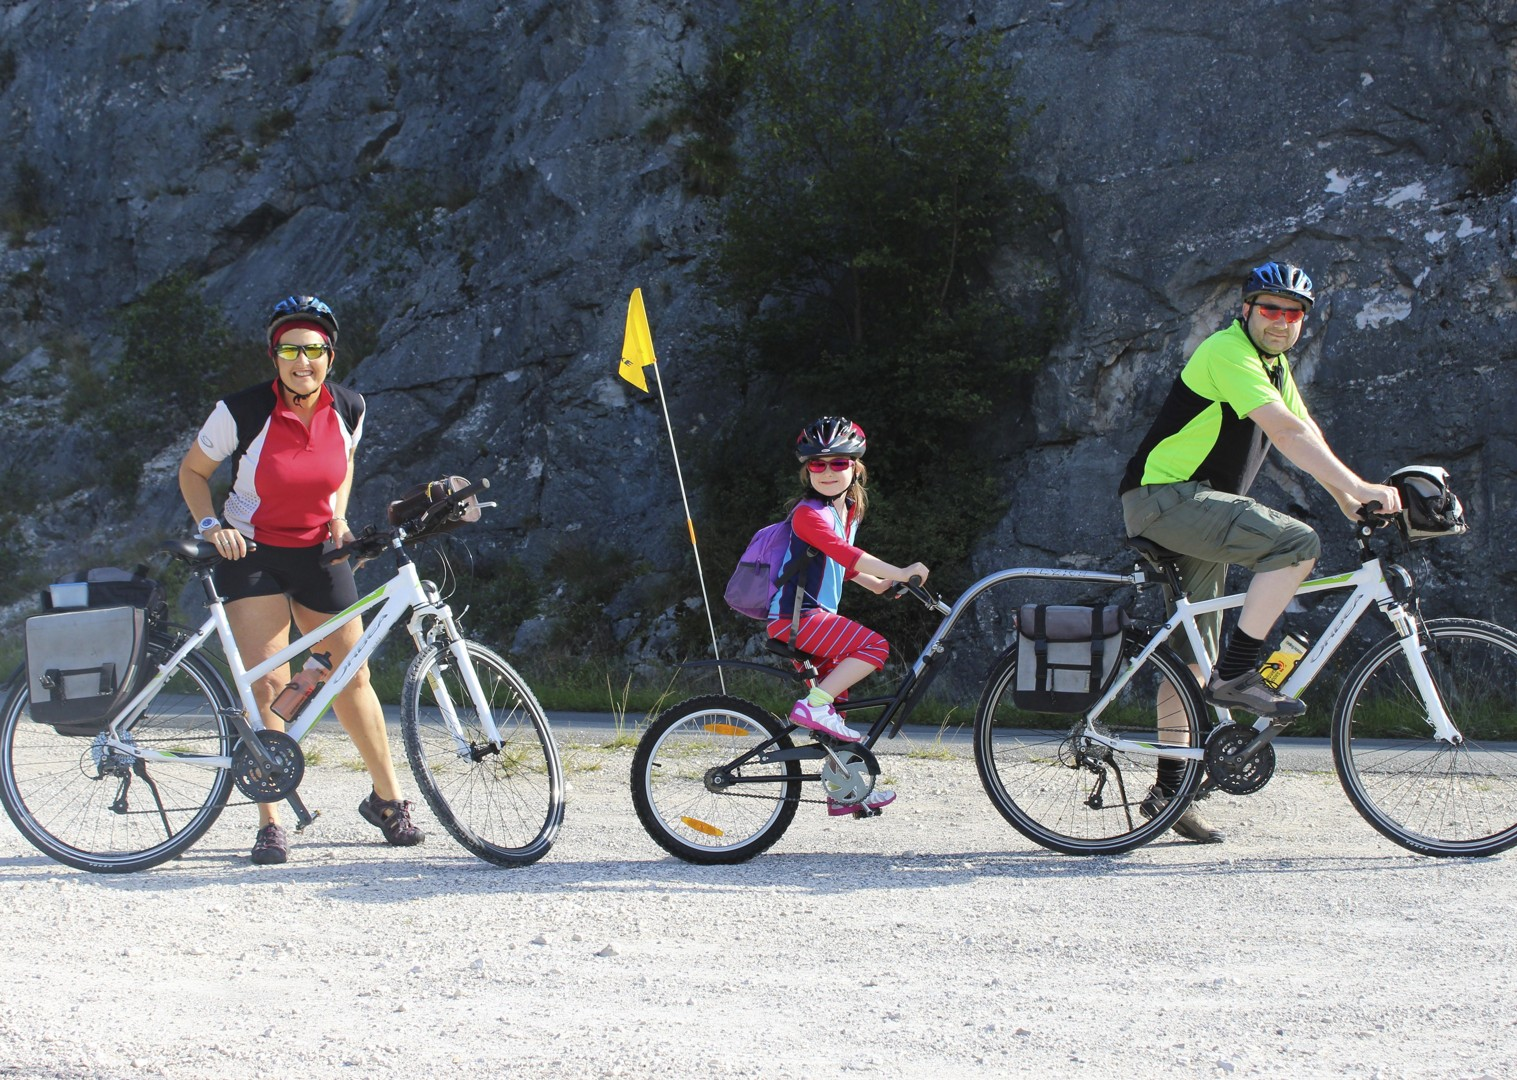 children-bikes-cycling-france-fun.jpg - NEW! France - Beach Odyssey - Family Cycling